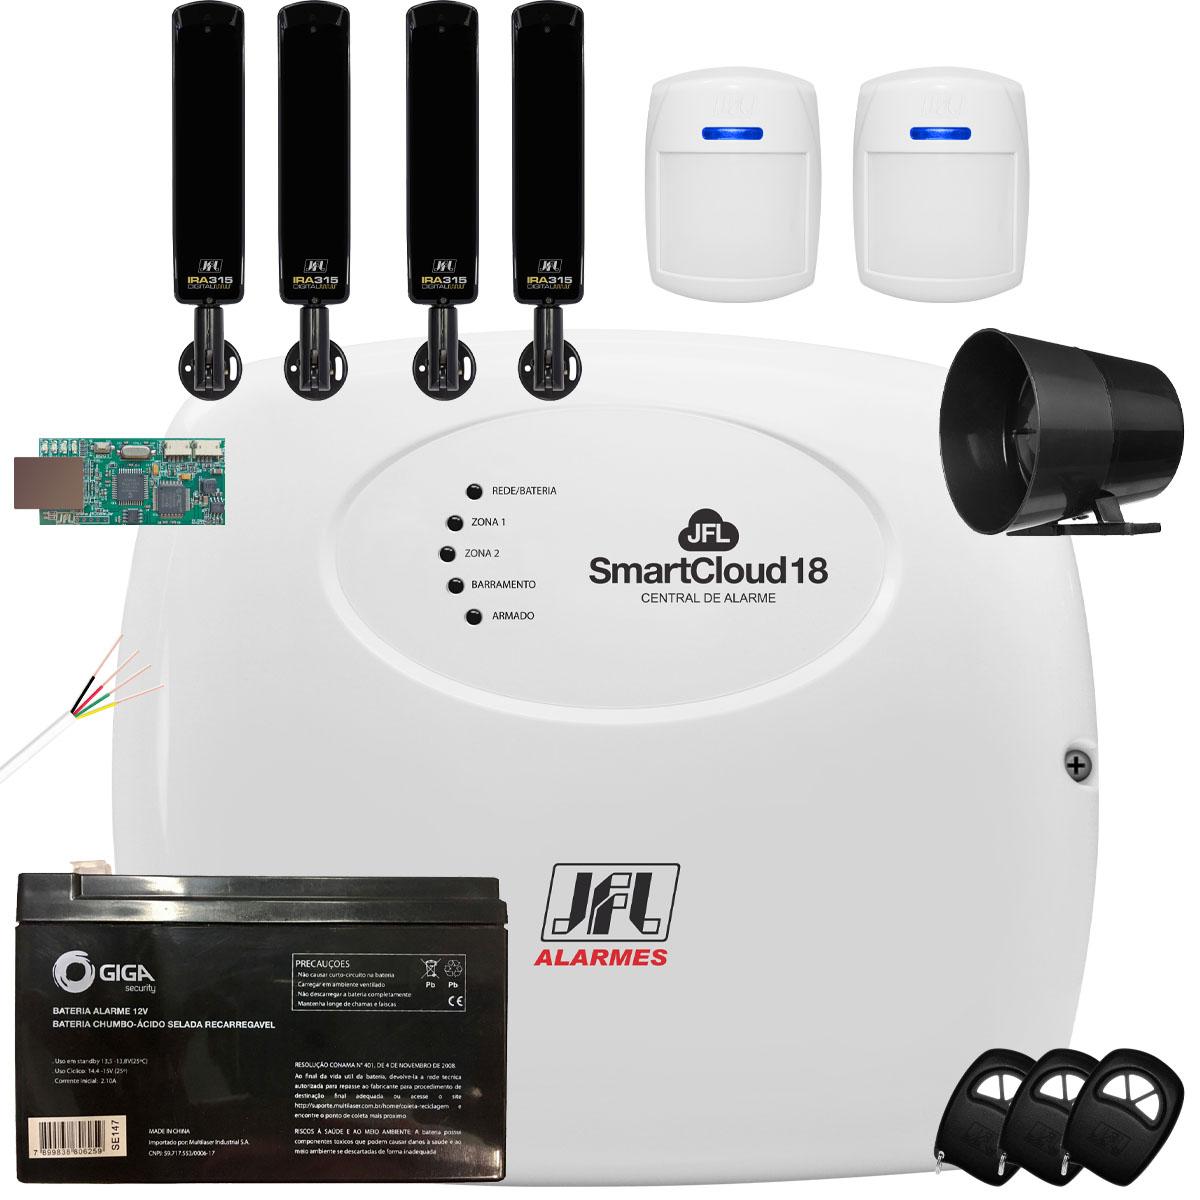 Kit Alarme SmartCloud 18 Jfl Com Sensores Ira 315 e Ds 510 Bus